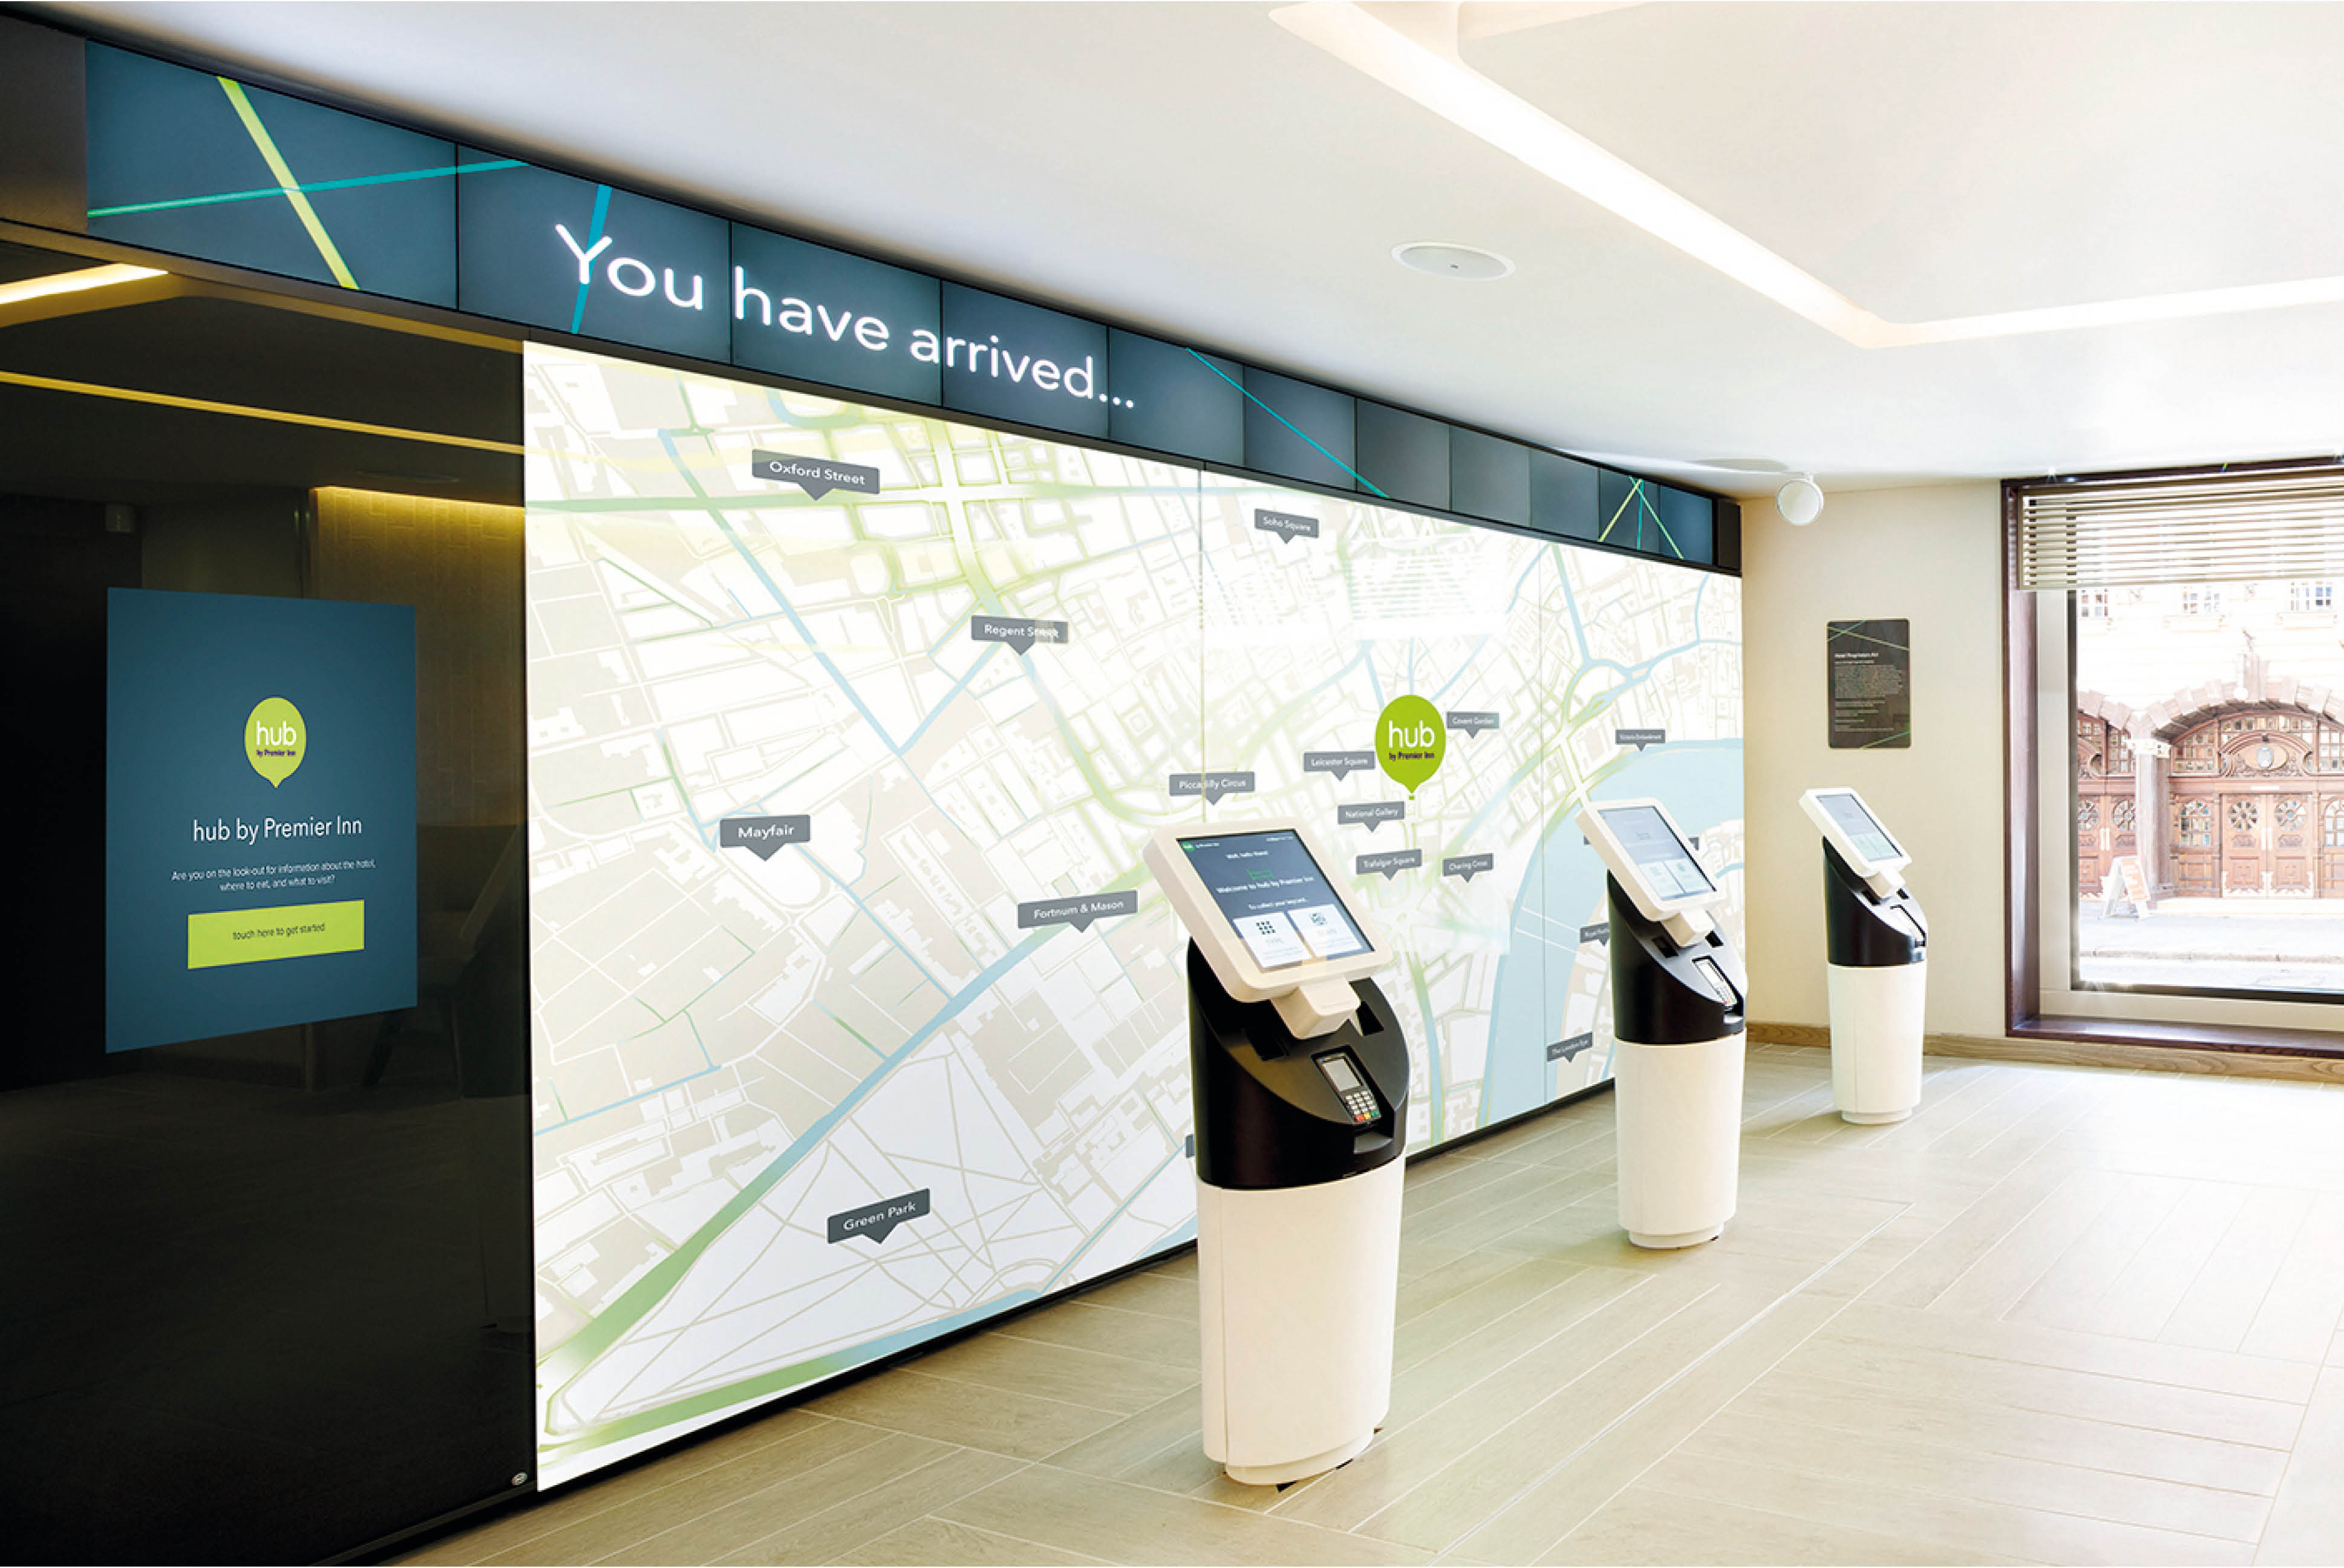 Hub by Premier Inn Signage | Independent Marketing Branding | IM London